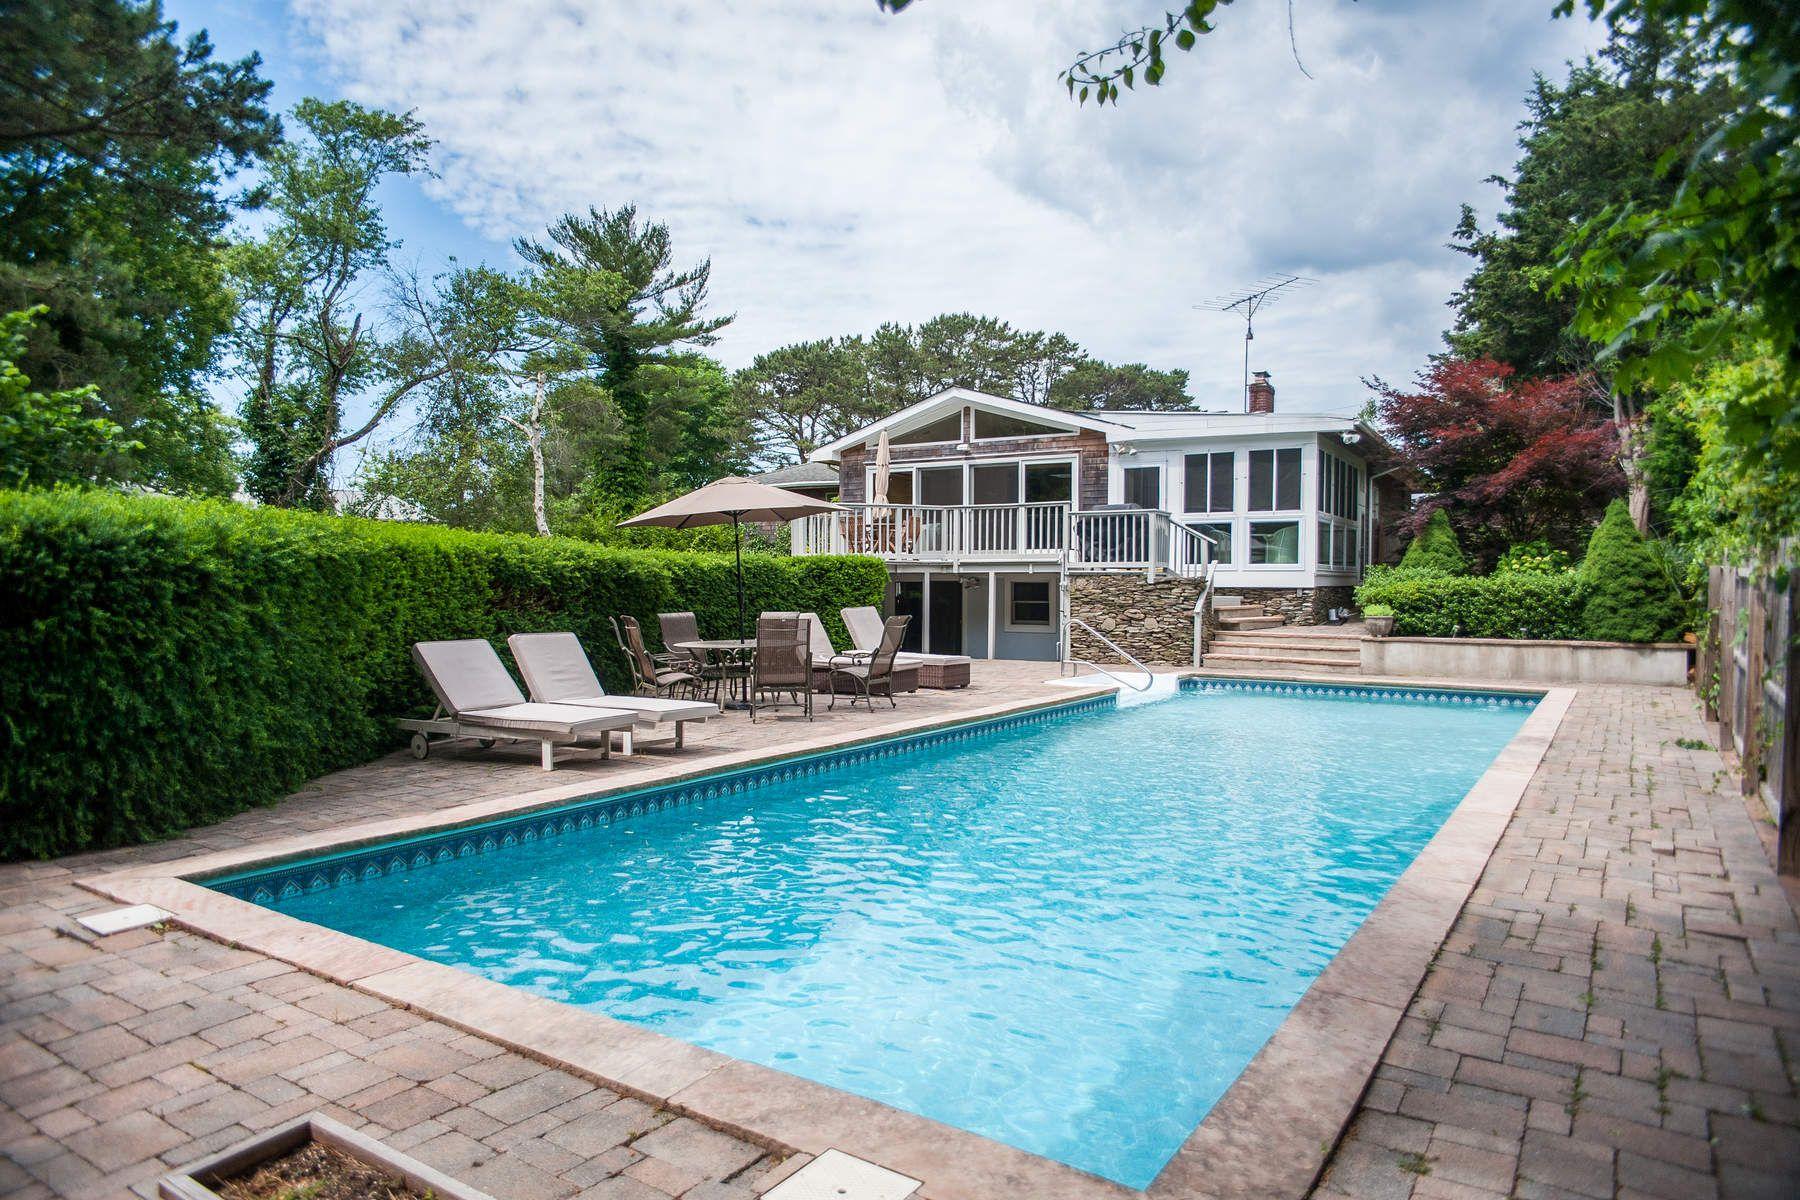 獨棟家庭住宅 為 出租 在 South of The Highway Summer Rental Southampton, 紐約州 11968 美國